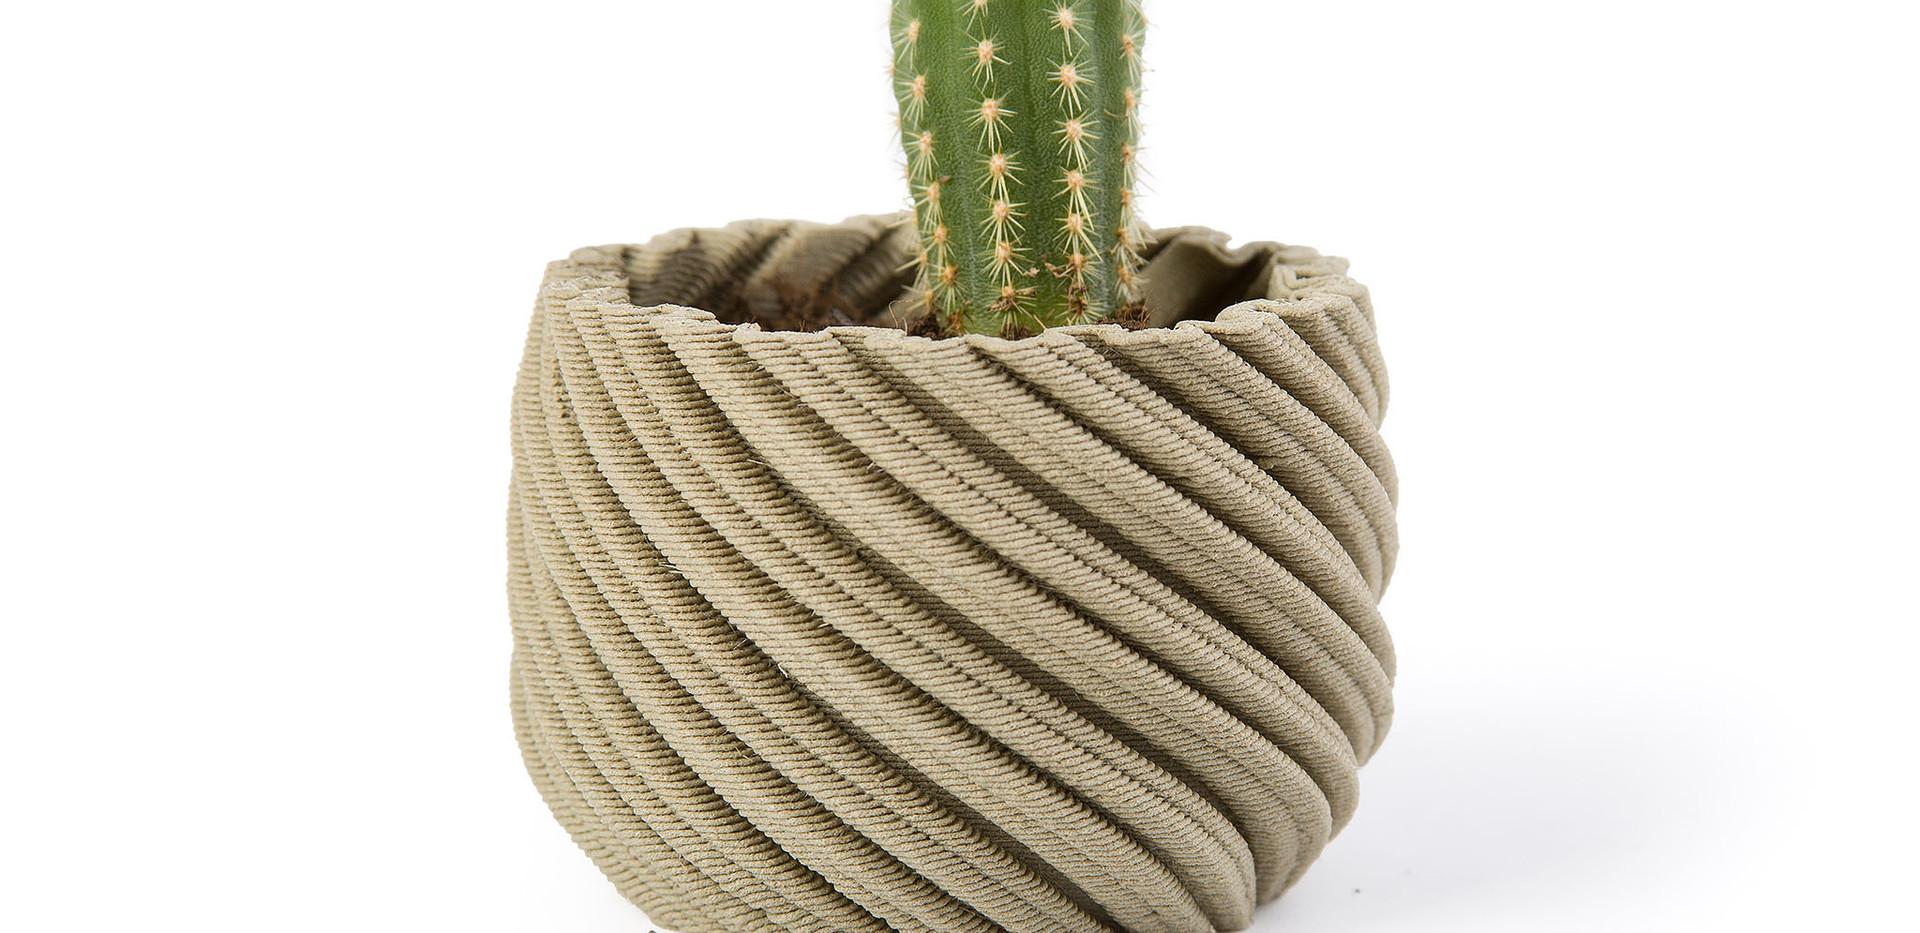 Cactus Champagne